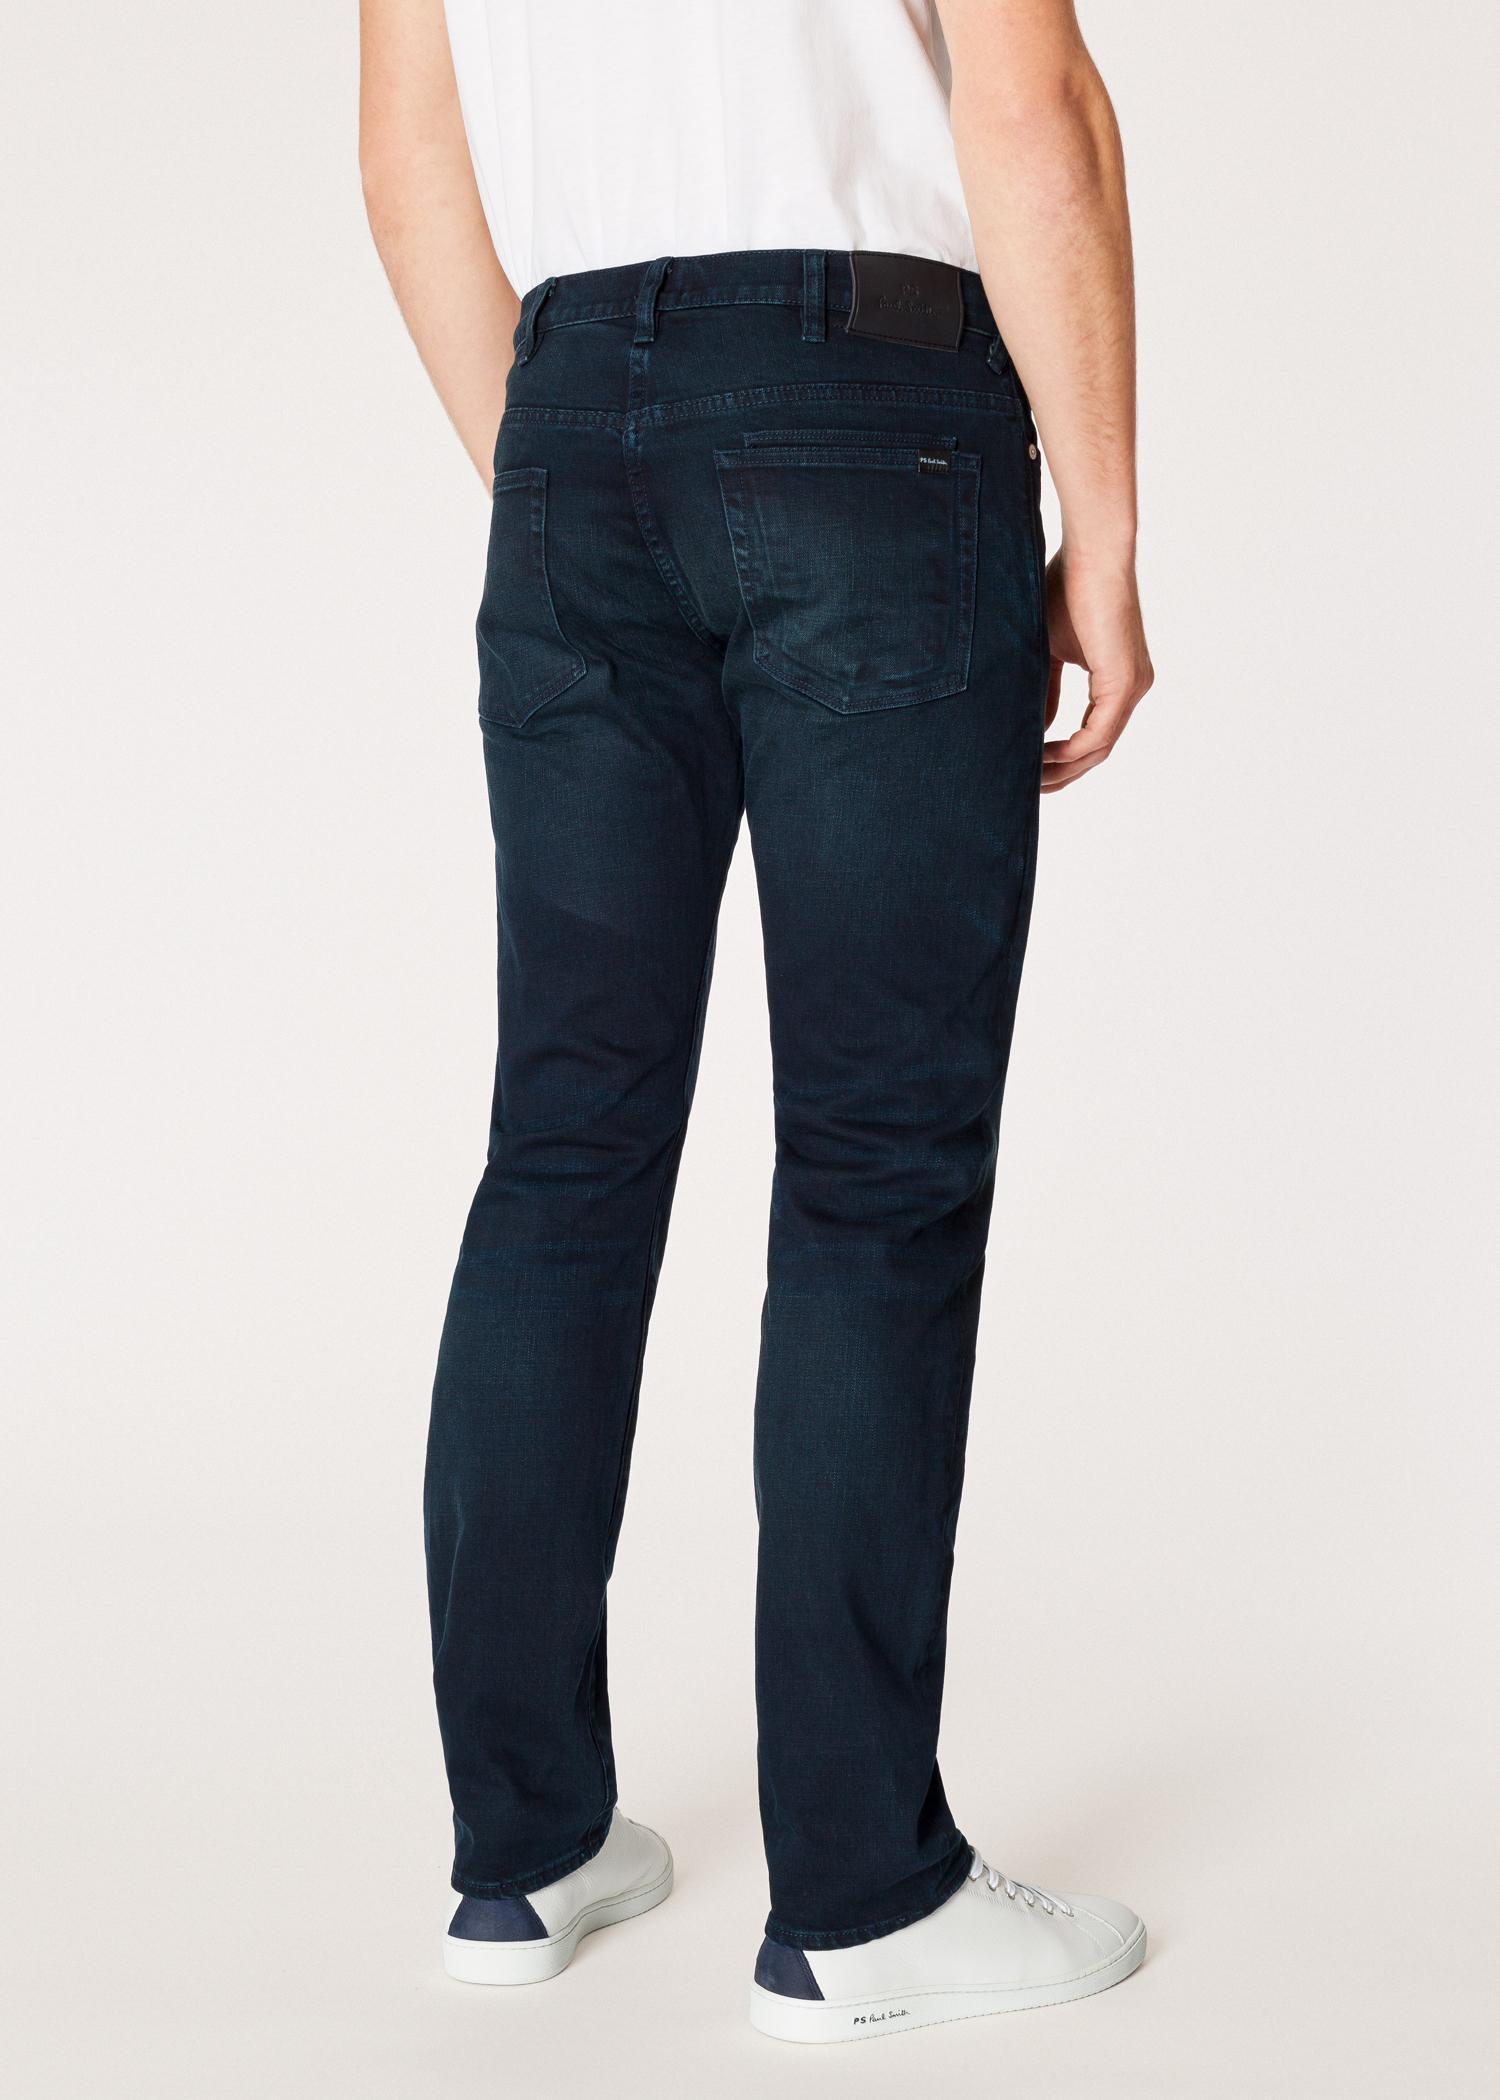 38aafb41047 Men s Standard-Fit  Crosshatch Stretch  Navy Over-Dye Jeans - Paul Smith